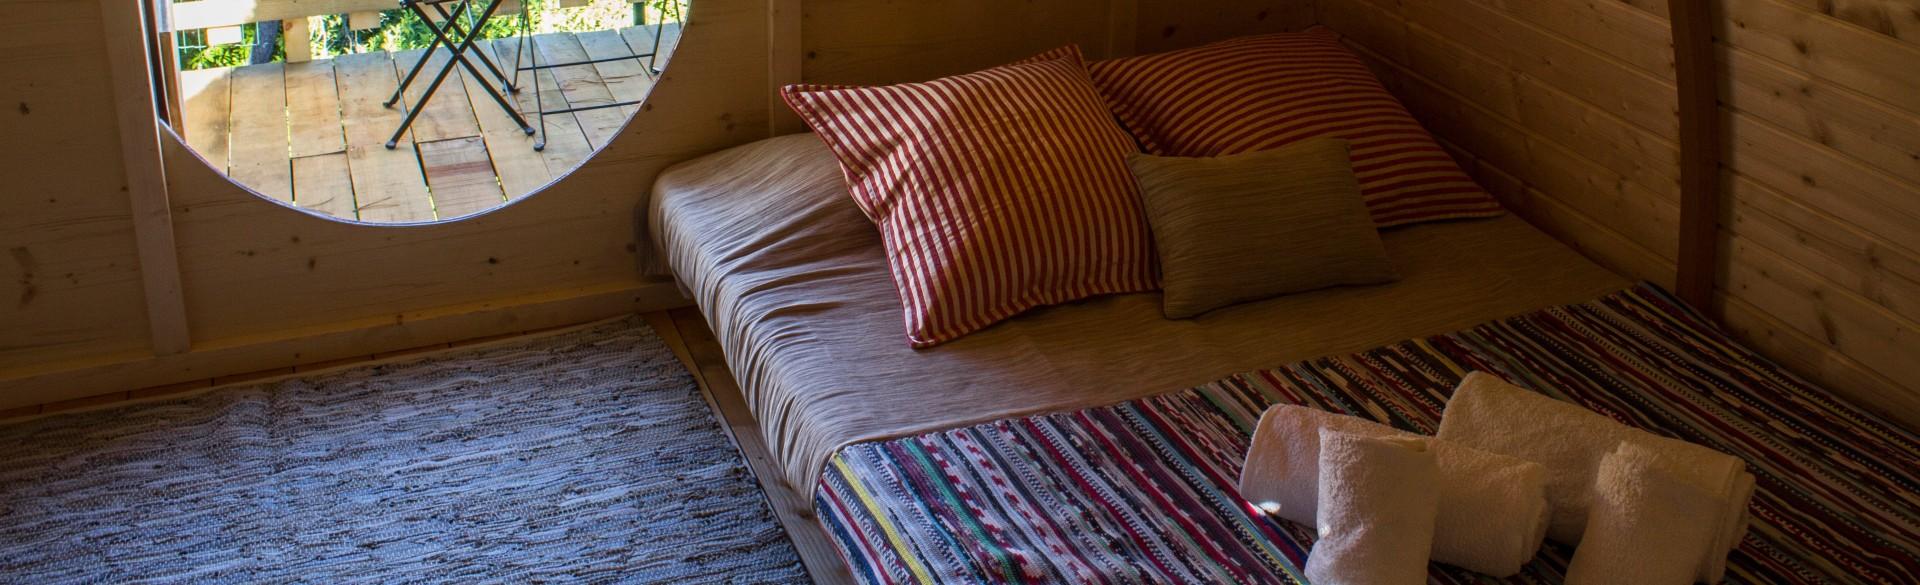 Hobbit House Vermelha - Camping Oleiros